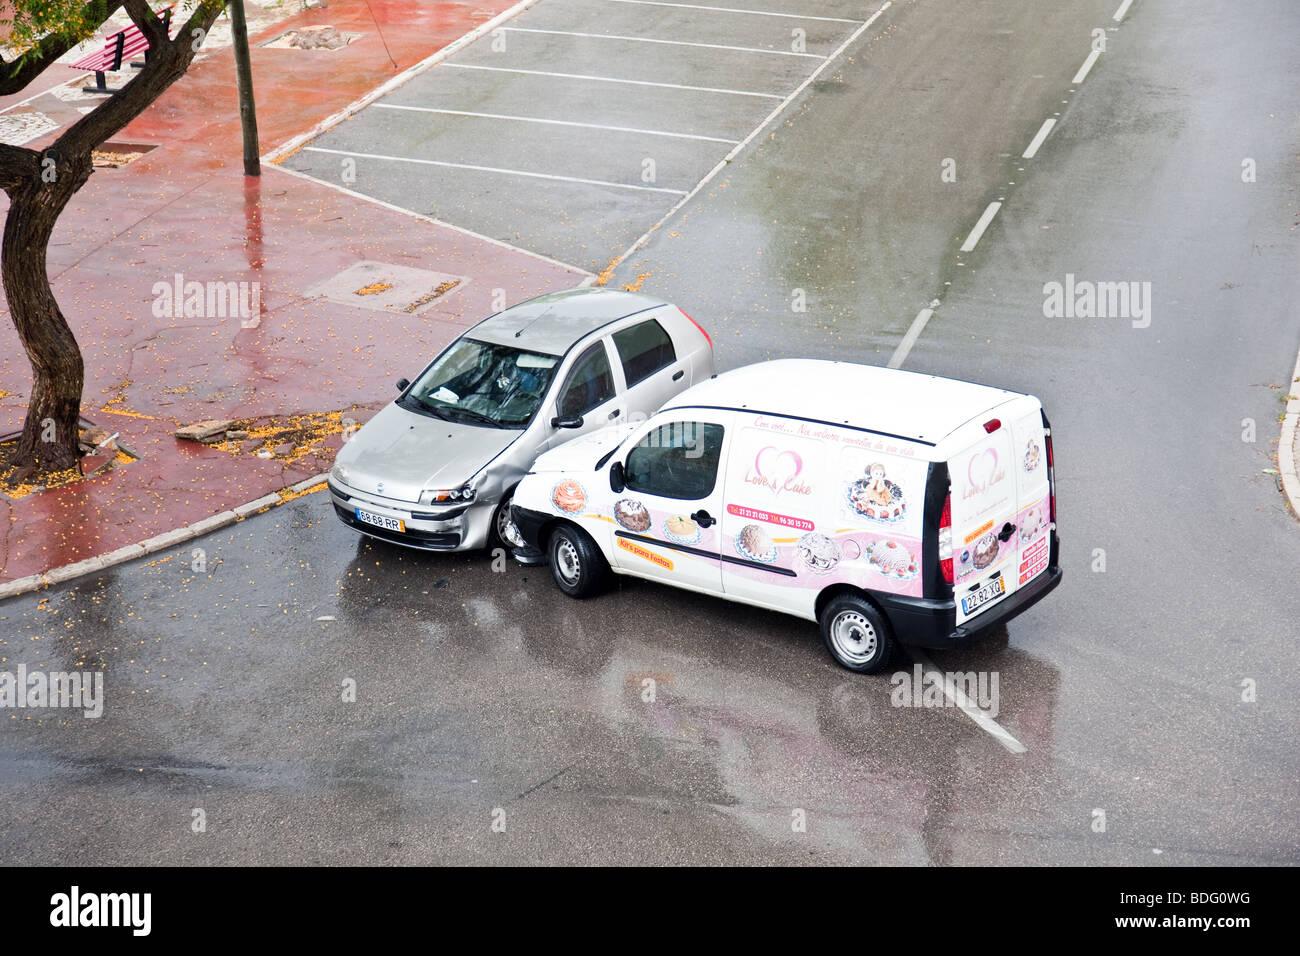 Accident Tracks Stockfotos & Accident Tracks Bilder - Alamy